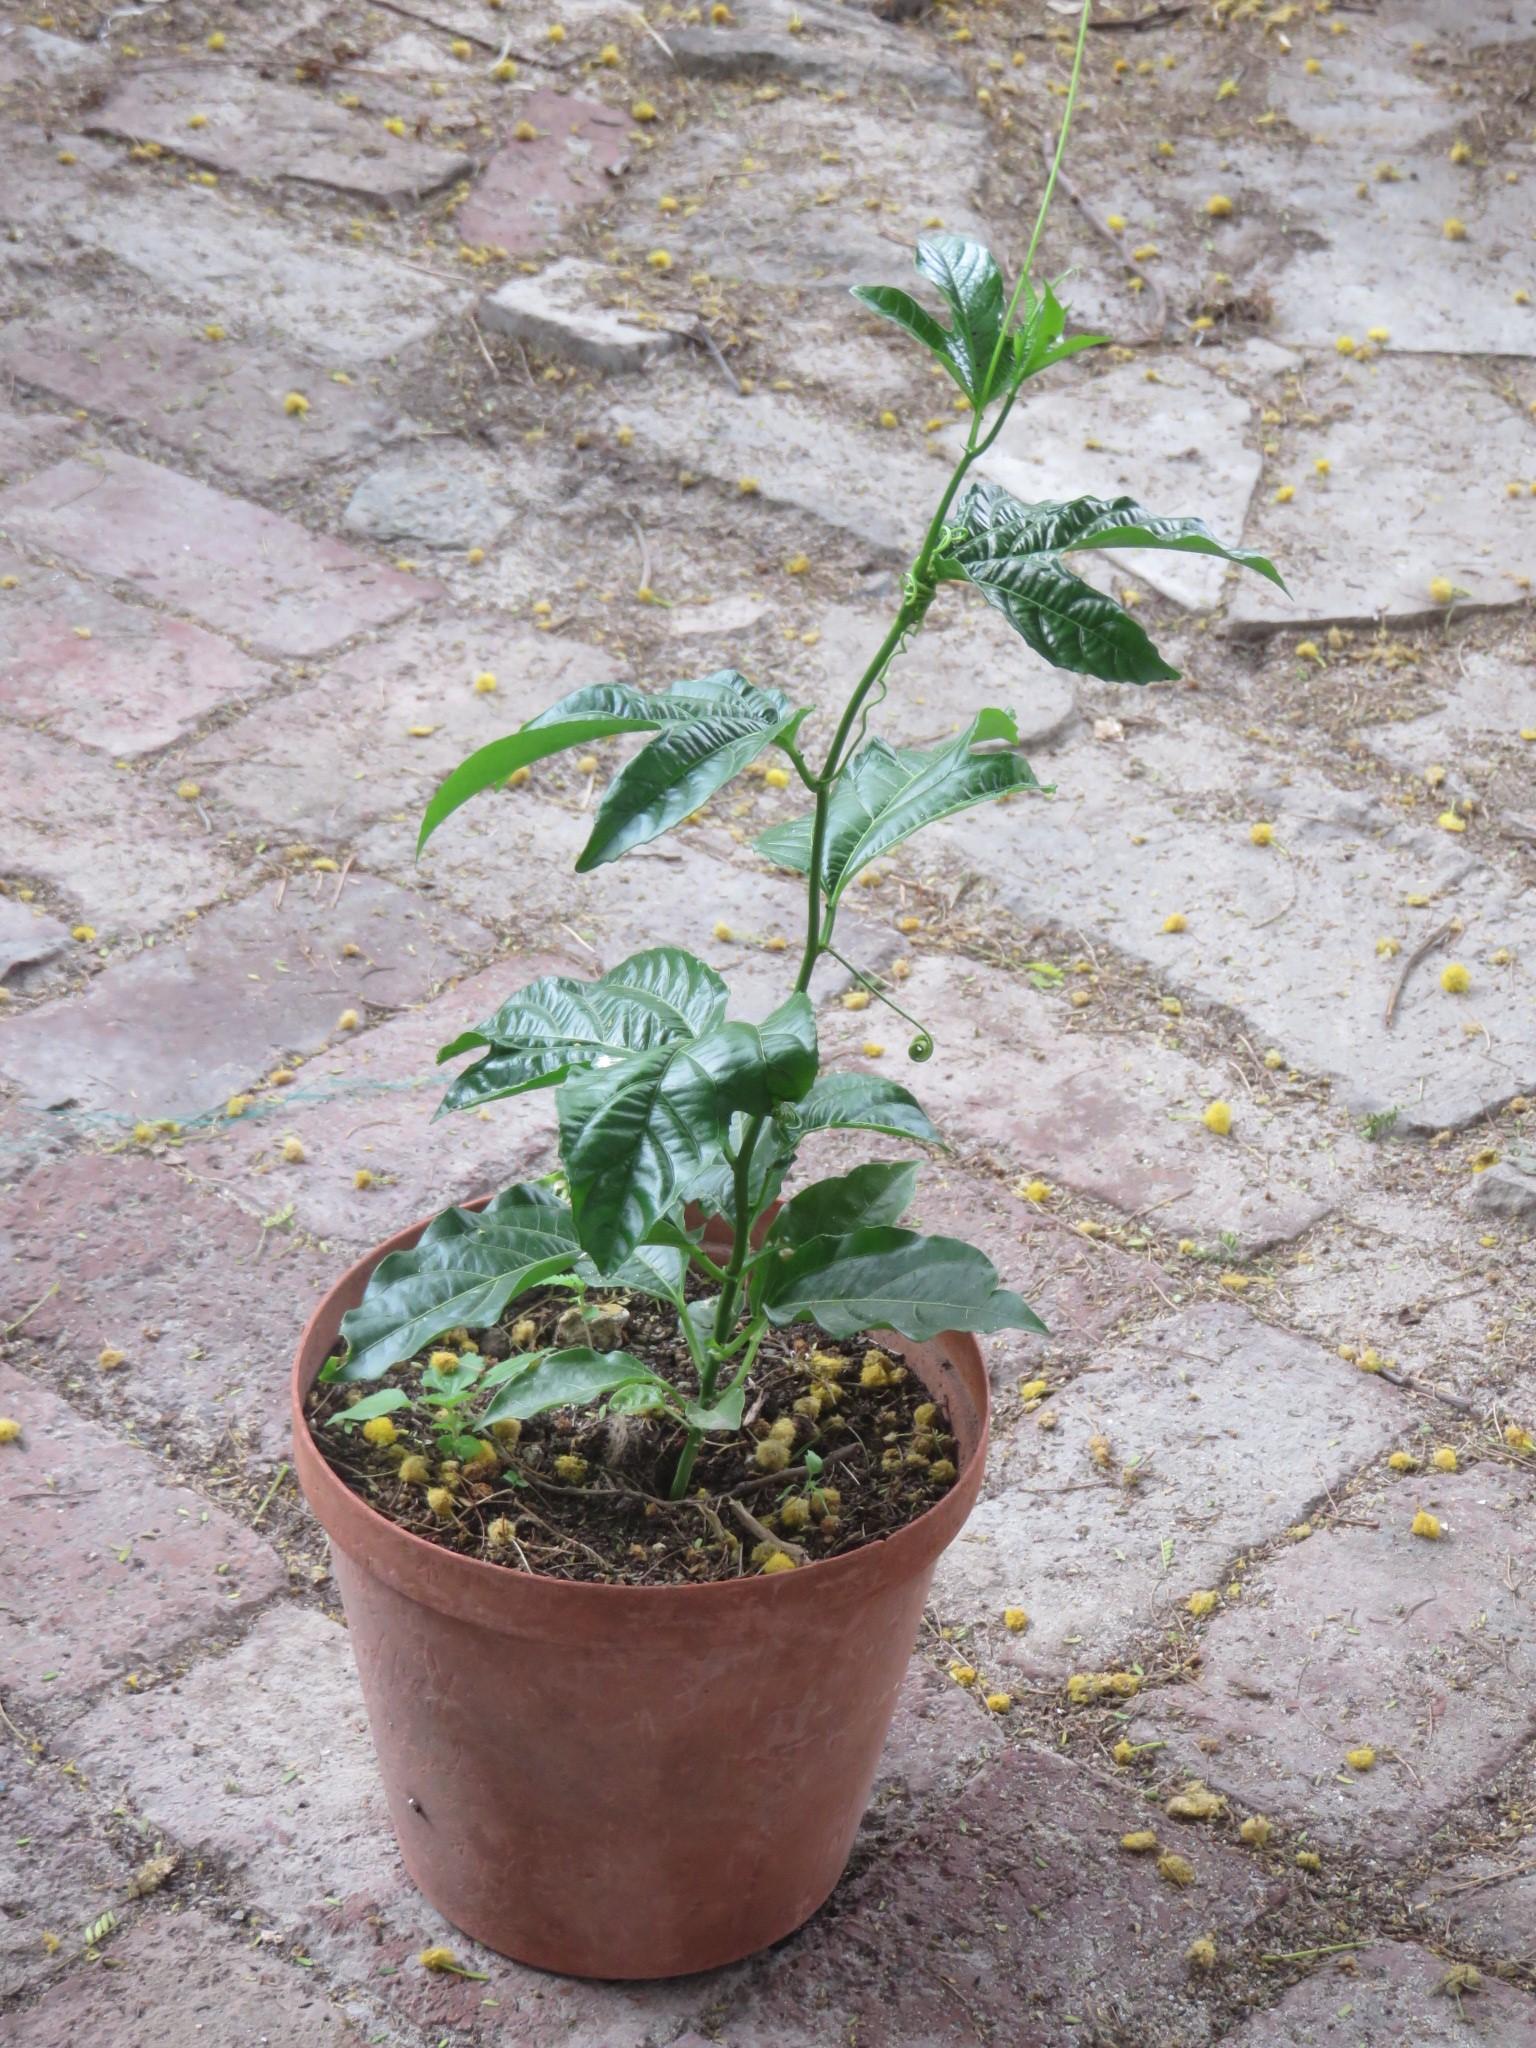 A vine ready to plant